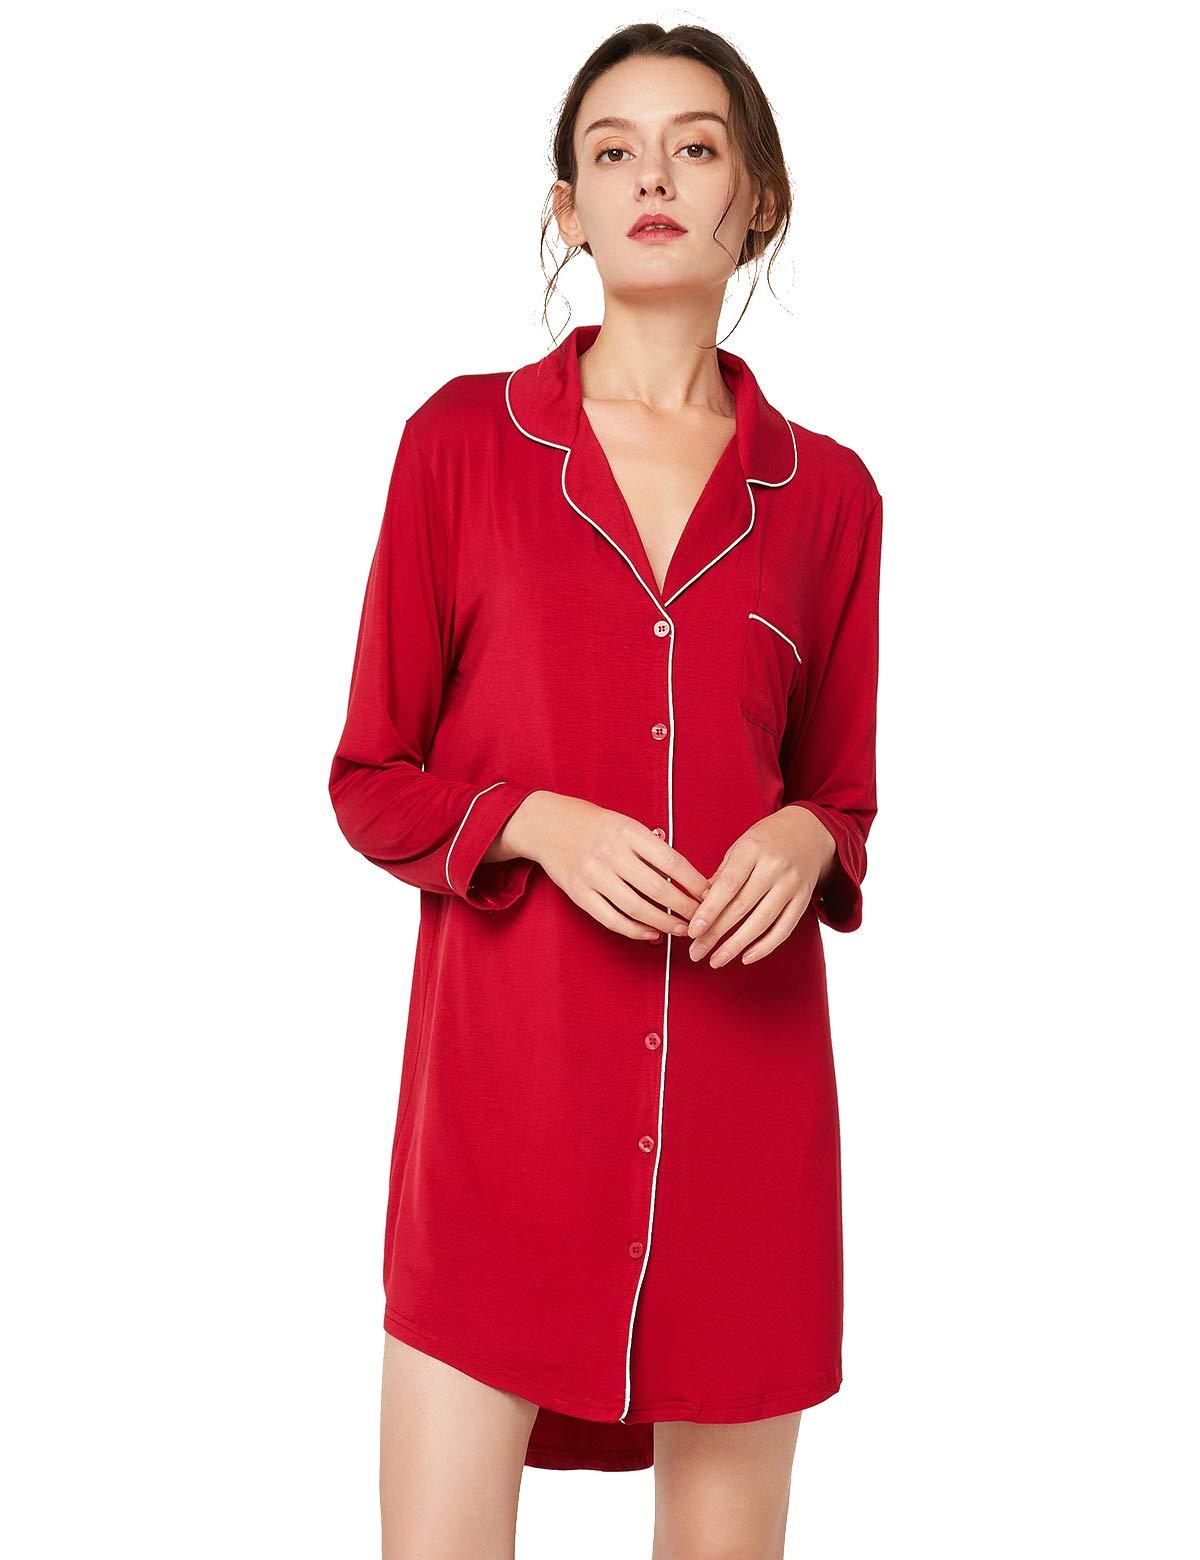 Escalier Women's Nightgown Button Down Nightshirt Long Sleeve Boyfriend Sleep Shirt Pajama Dress Sleepwear